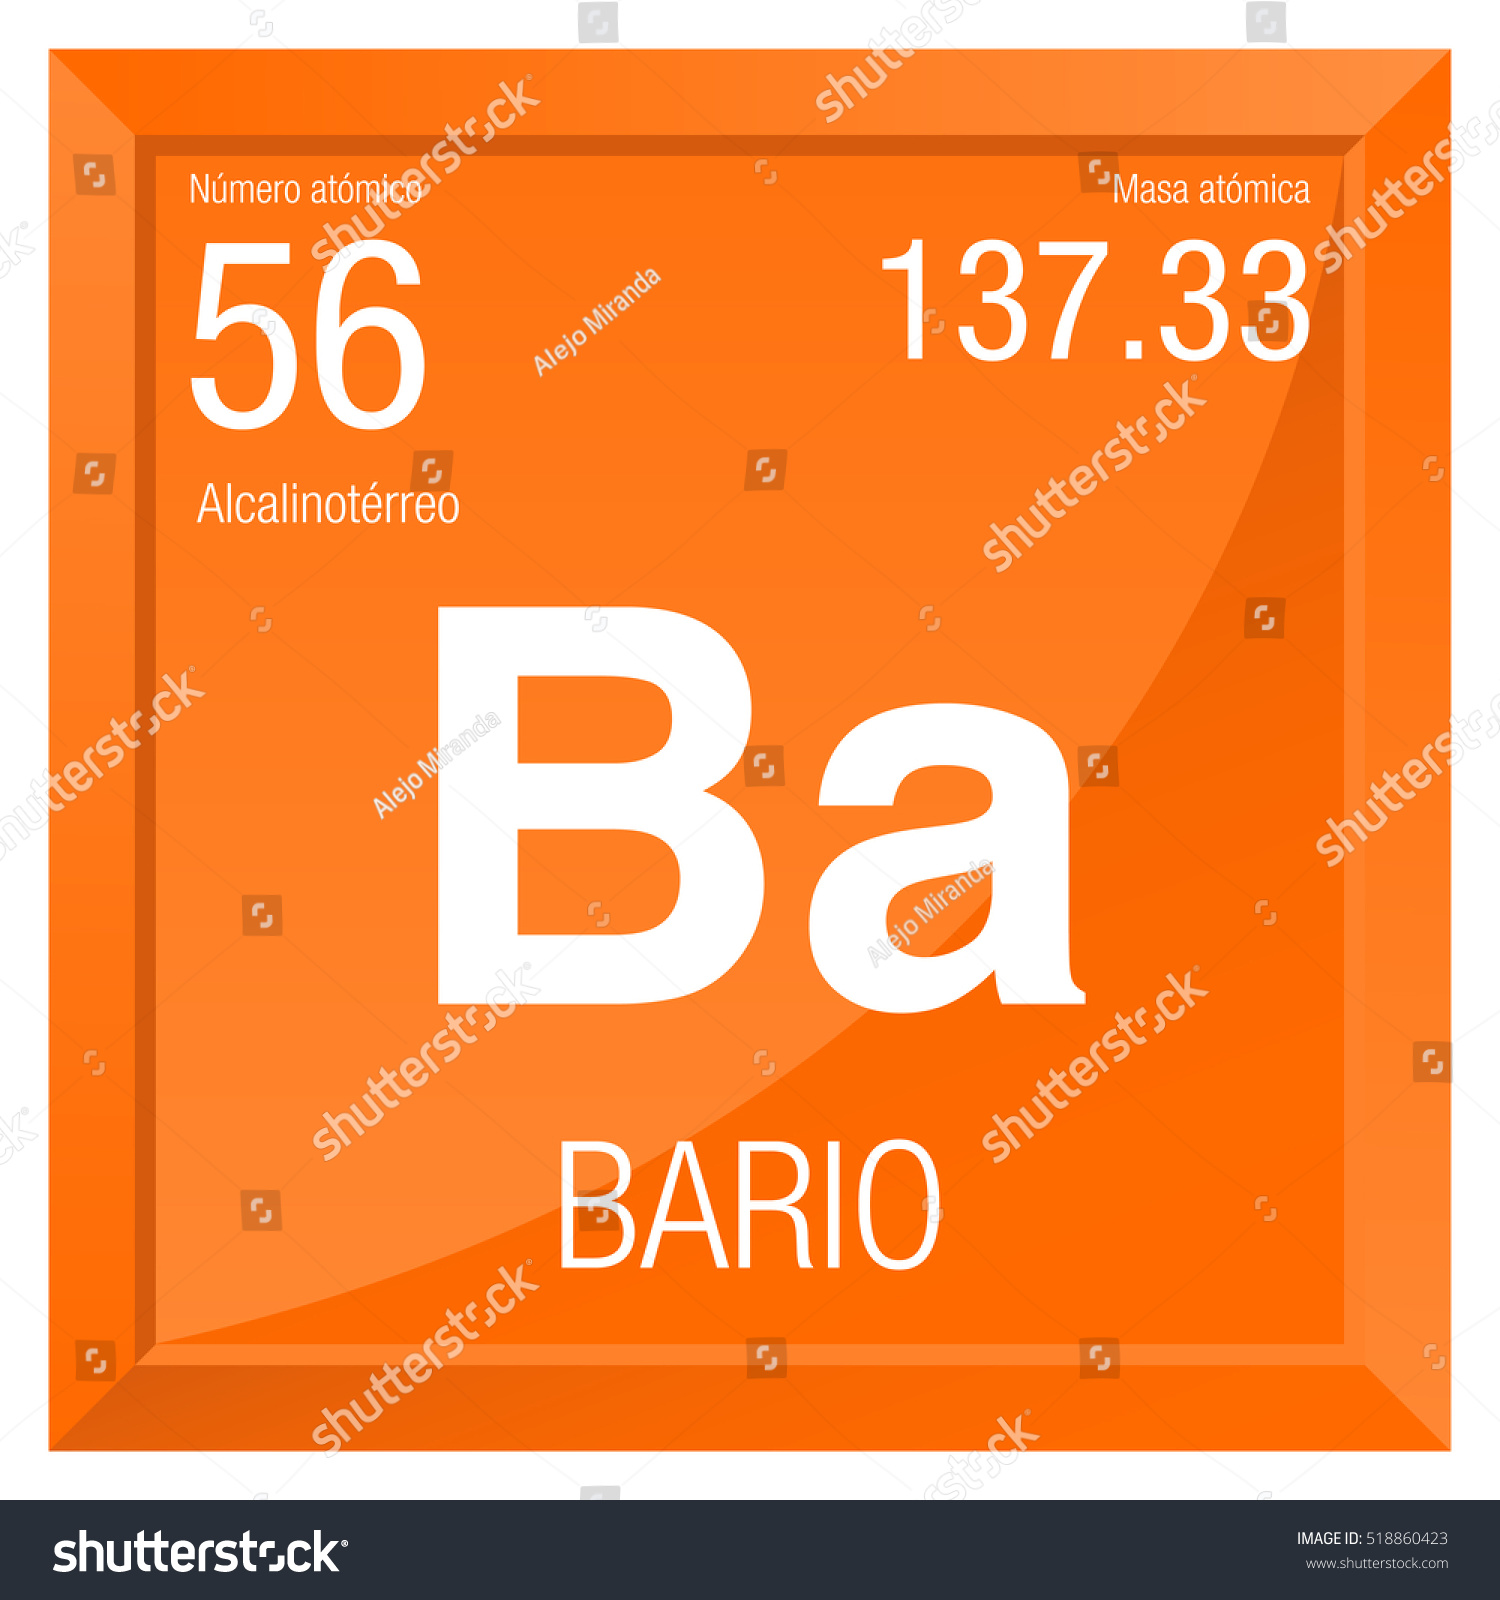 Bario symbol barium spanish language element stock vector bario symbol barium in spanish language element number 56 of the periodic table of gamestrikefo Image collections